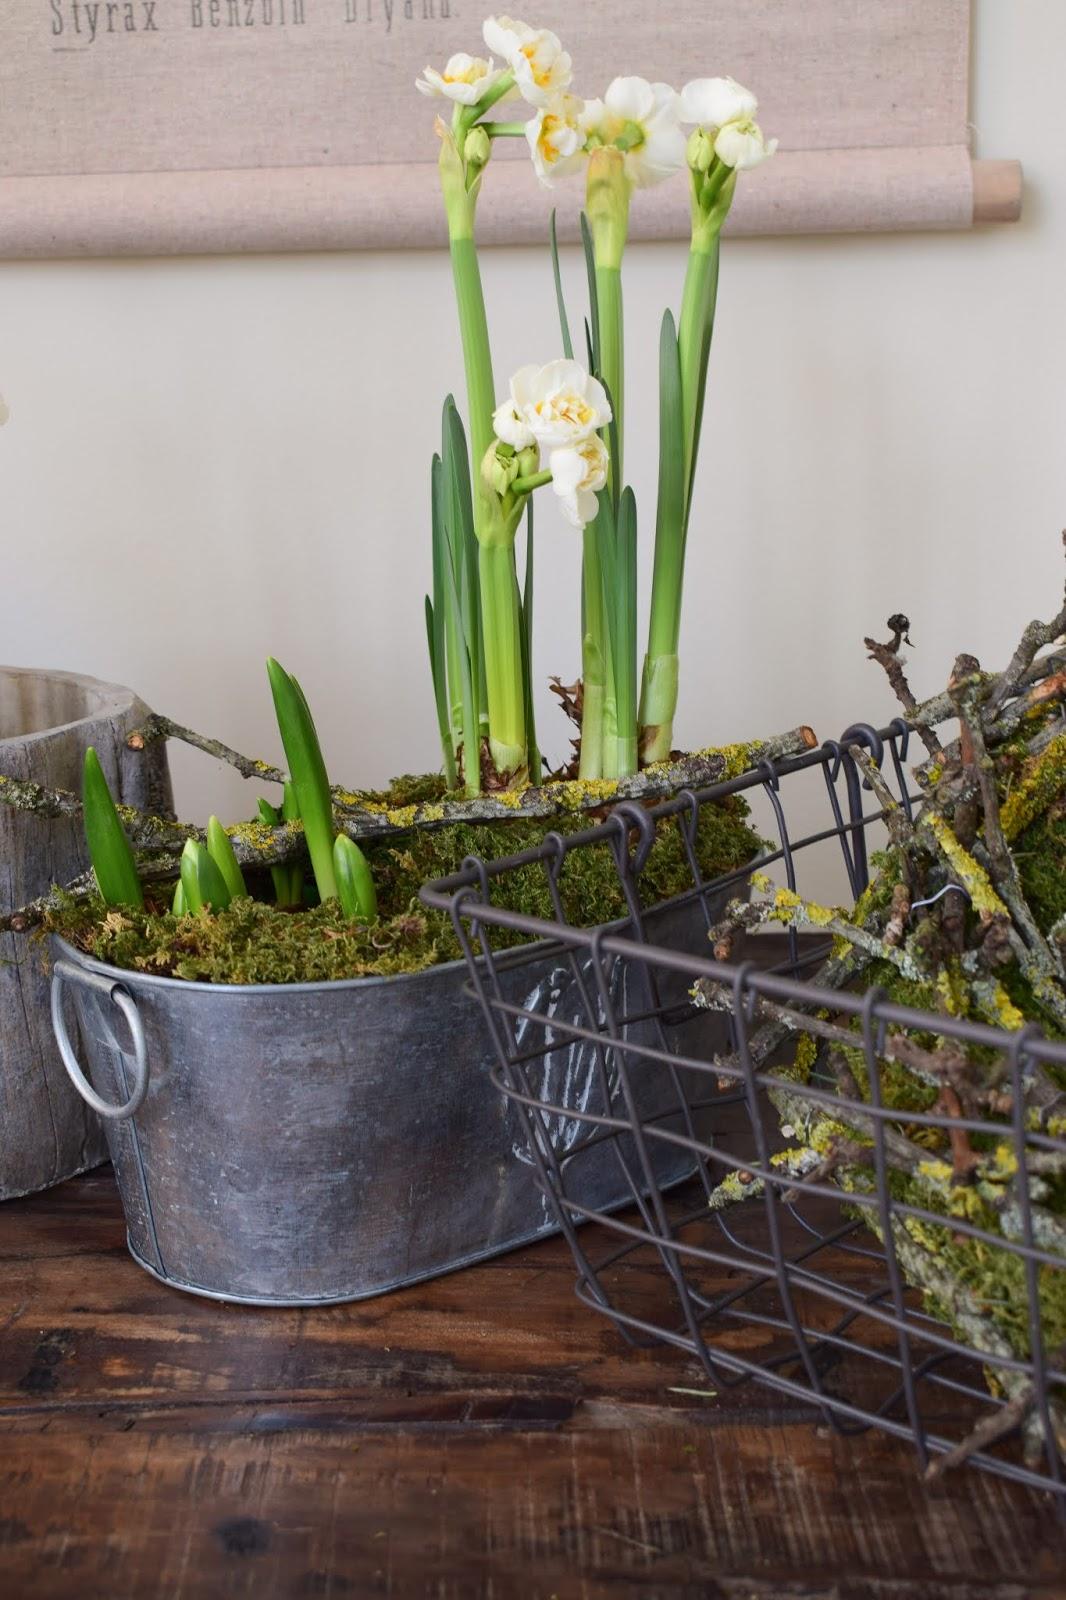 Narzisse bridal crown im Topf. Frühlingsblüher Frühlingsdeko mit Naturmaterialien Topfpflanze